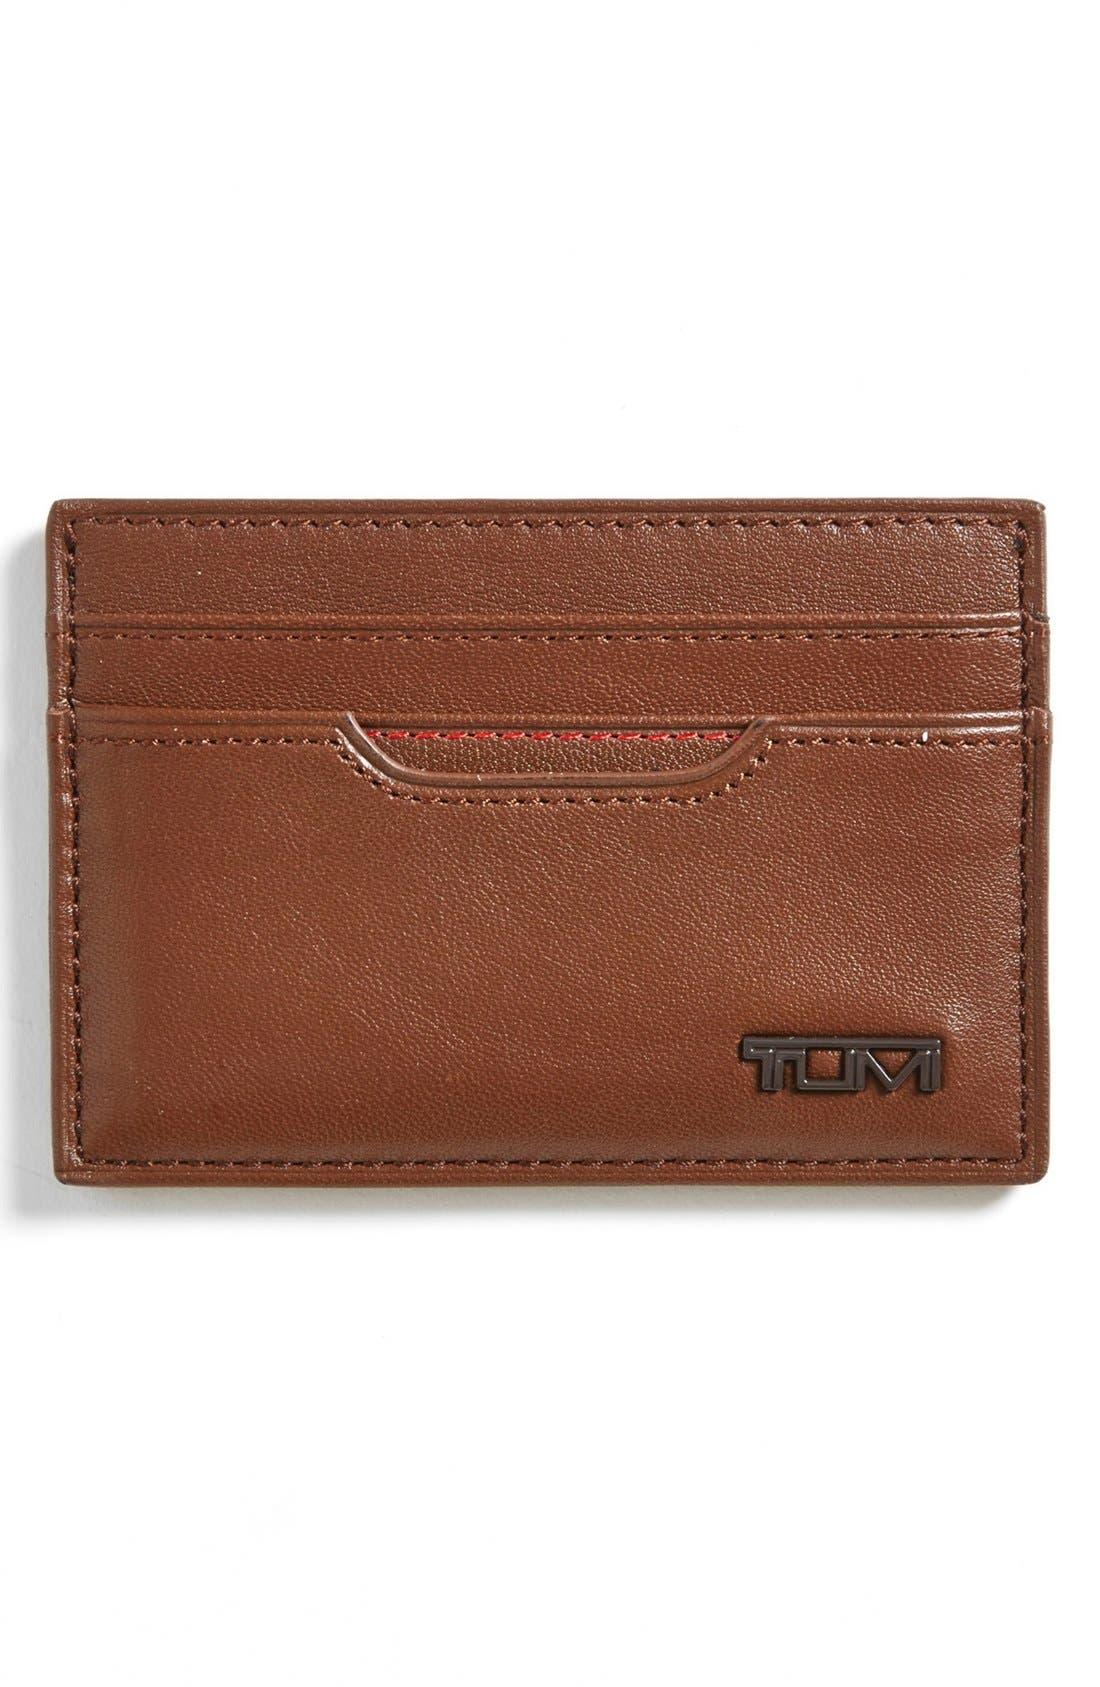 Main Image - Tumi 'Slim' Card Case ID Wallet